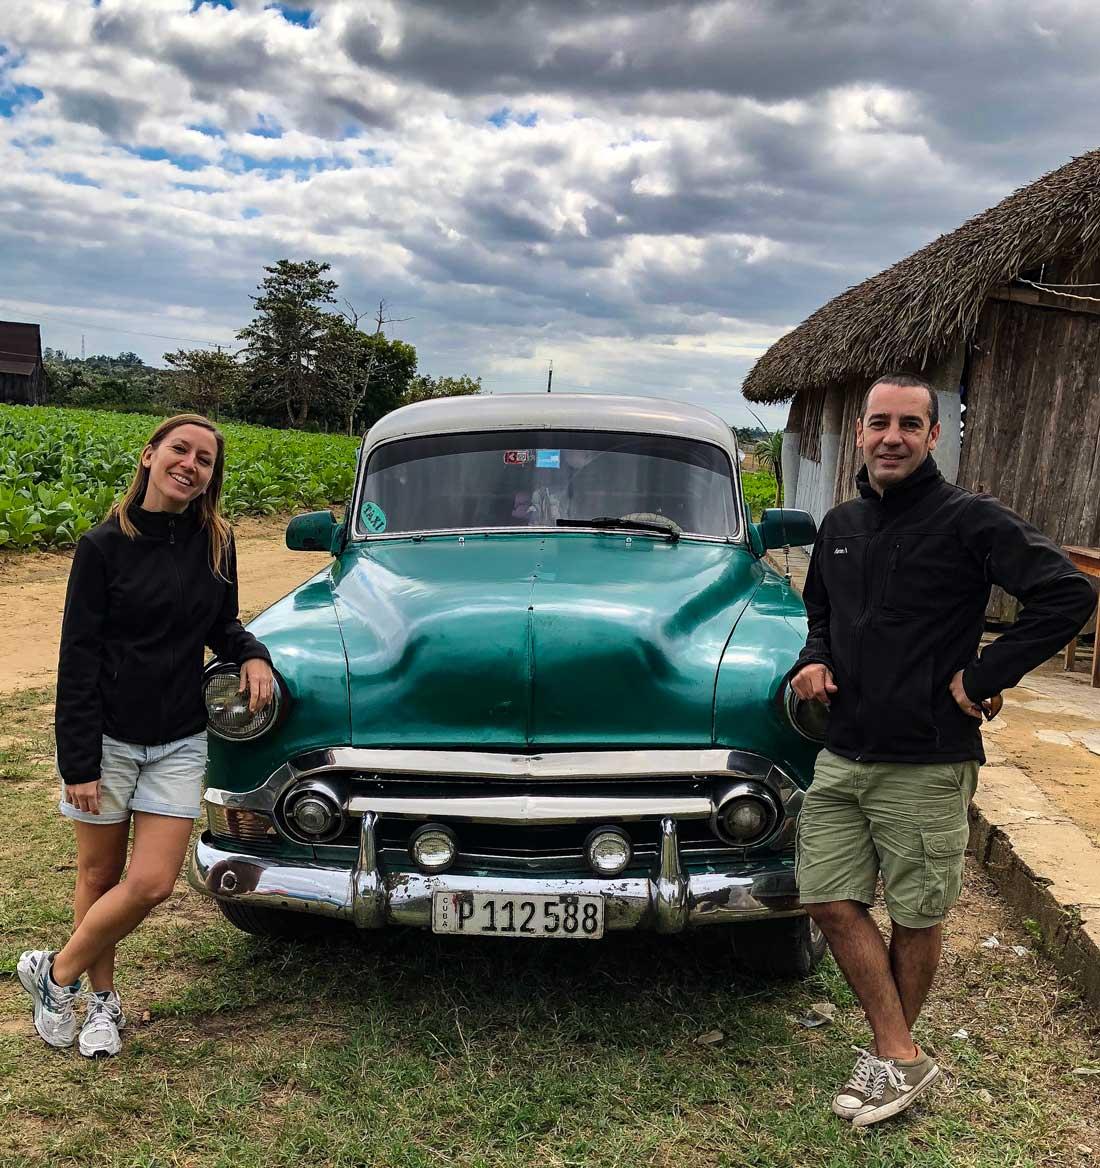 Itinerario 15 días Cuba Ruta Plantación secadero de Tabaco, Pinar del Río, Viñales, Cuba taxi